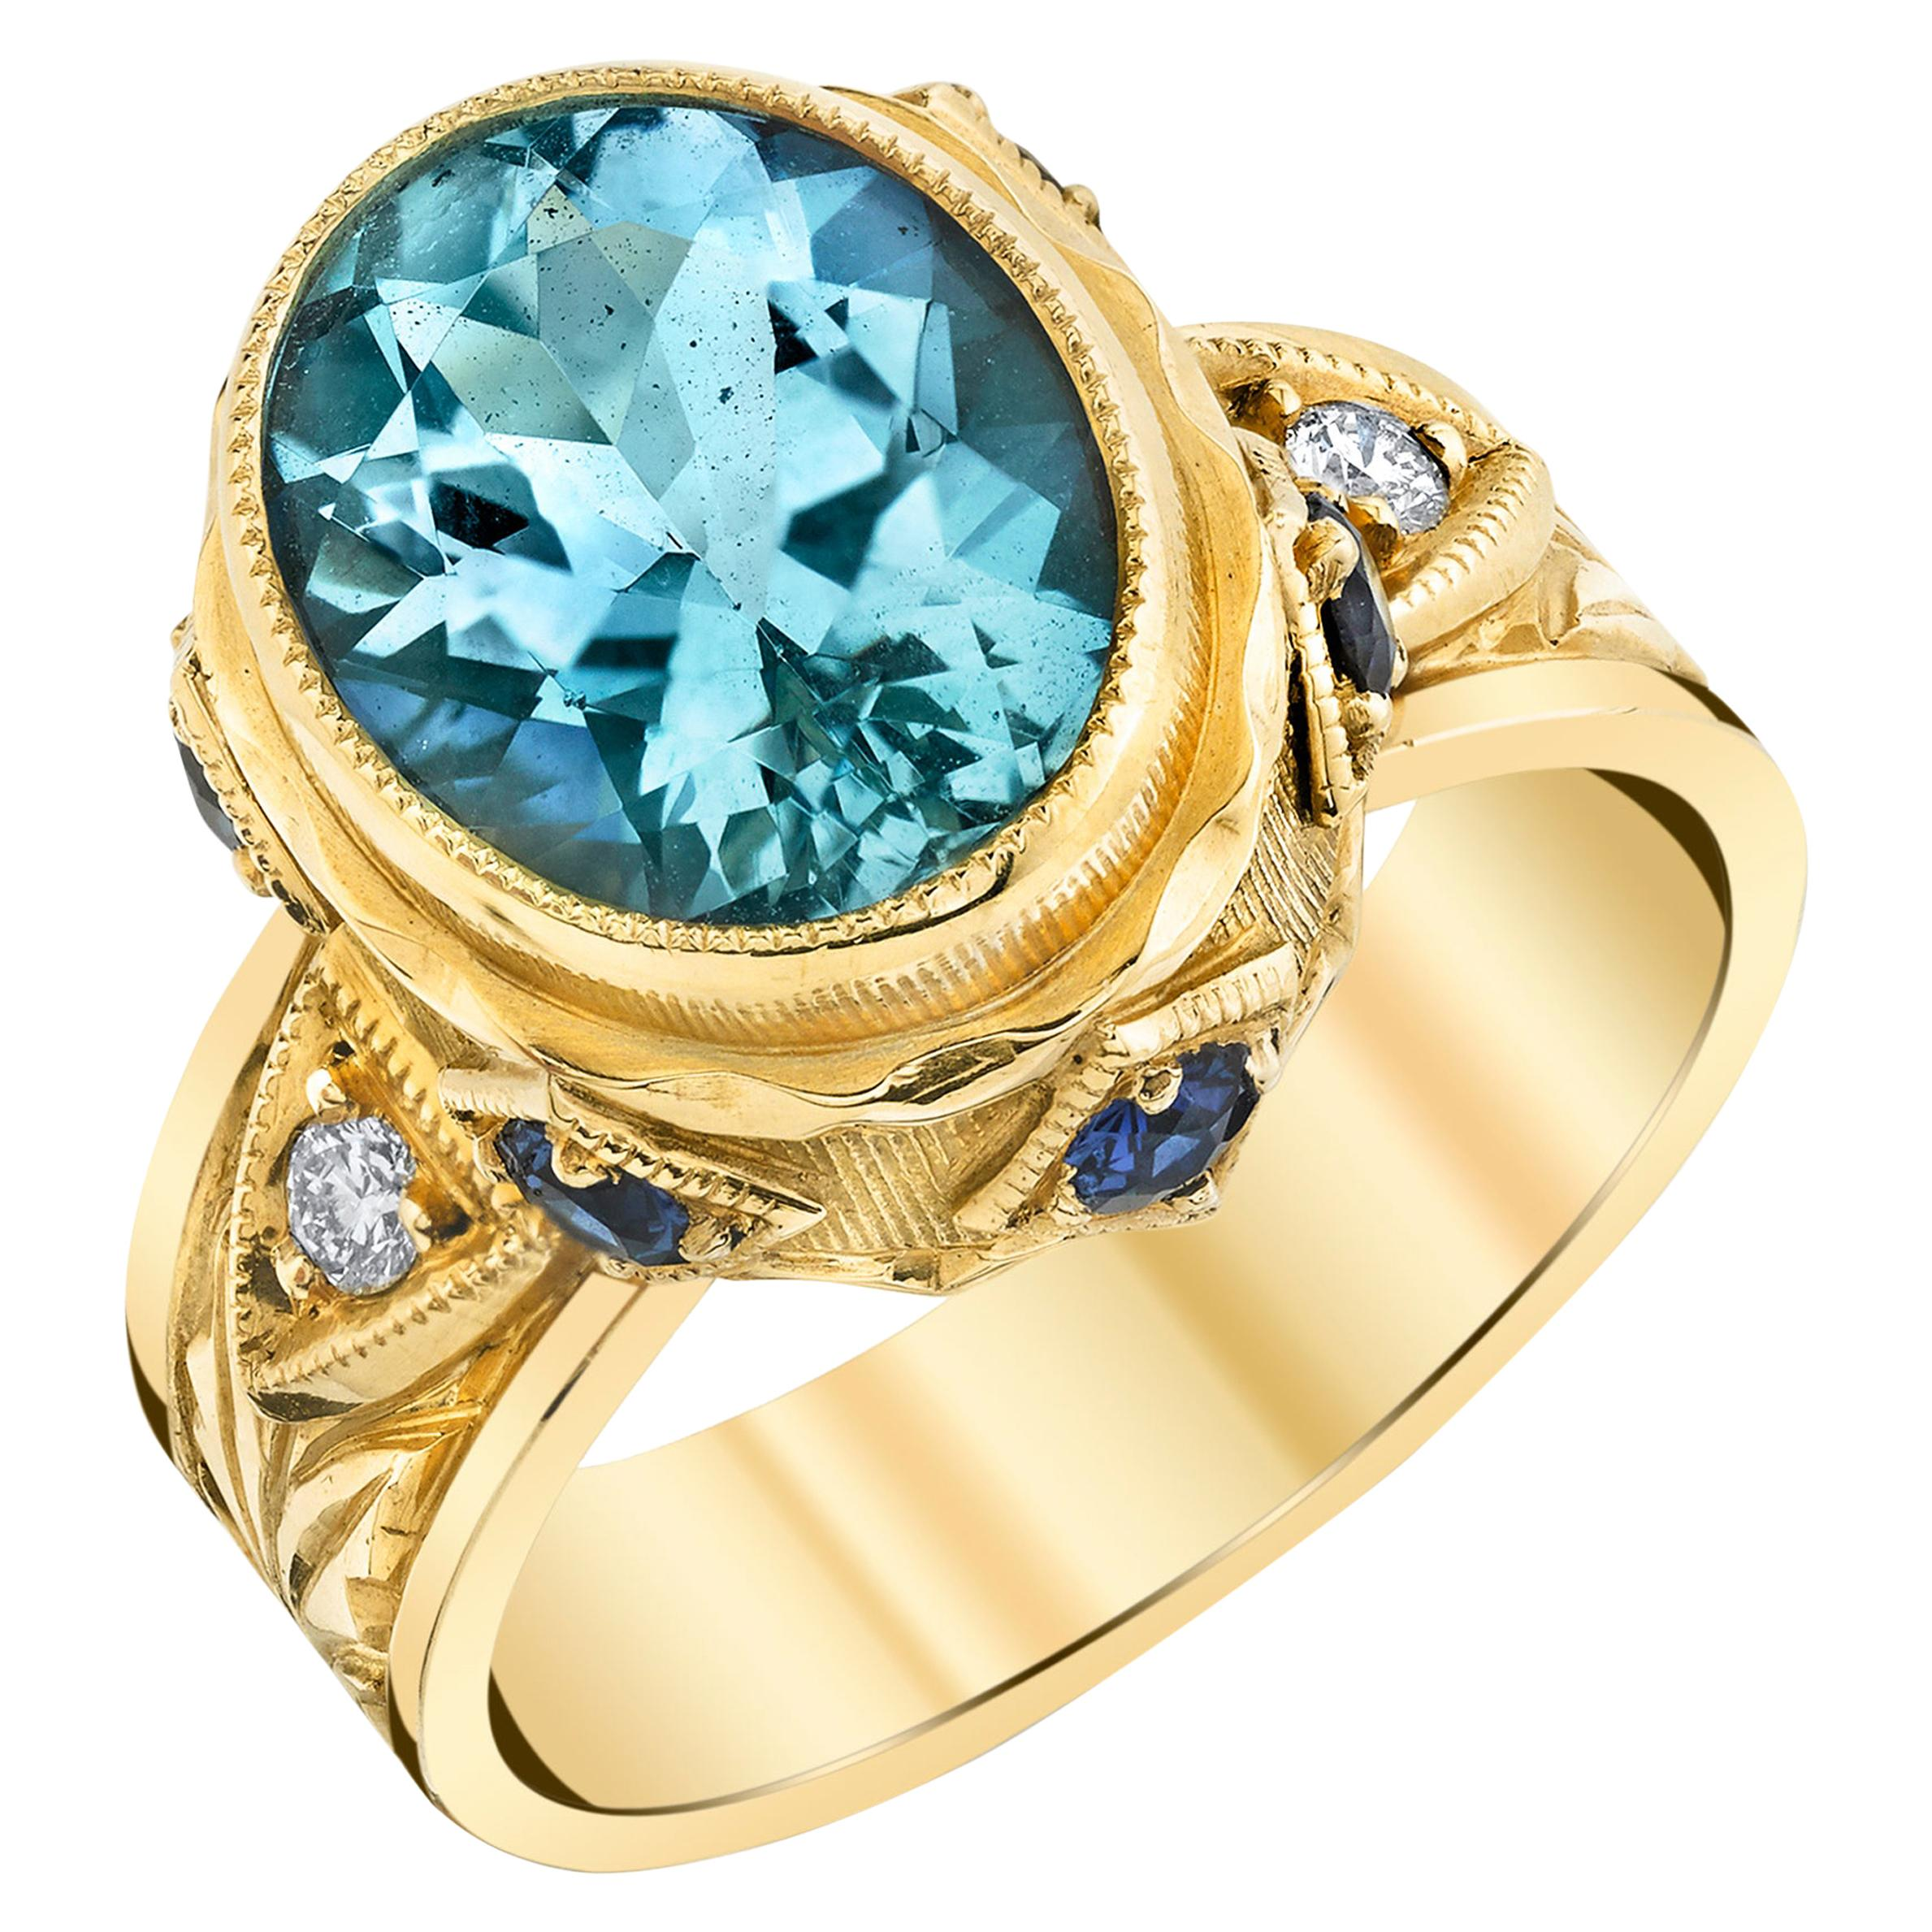 3.13 ct. Aquamarine, Blue Sapphire, Diamond Yellow Gold Engraved Bezel Band Ring